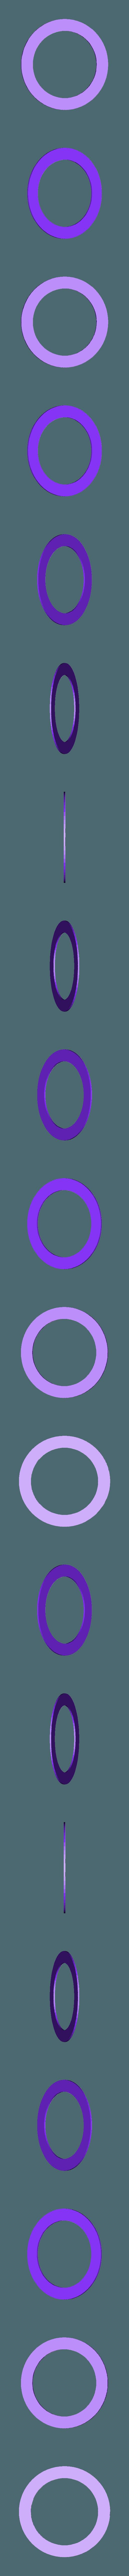 Rotary_Wheel_Blue.stl Download free STL file Rotary International Symbol - Dual Extrusion • 3D printer template, abbymath